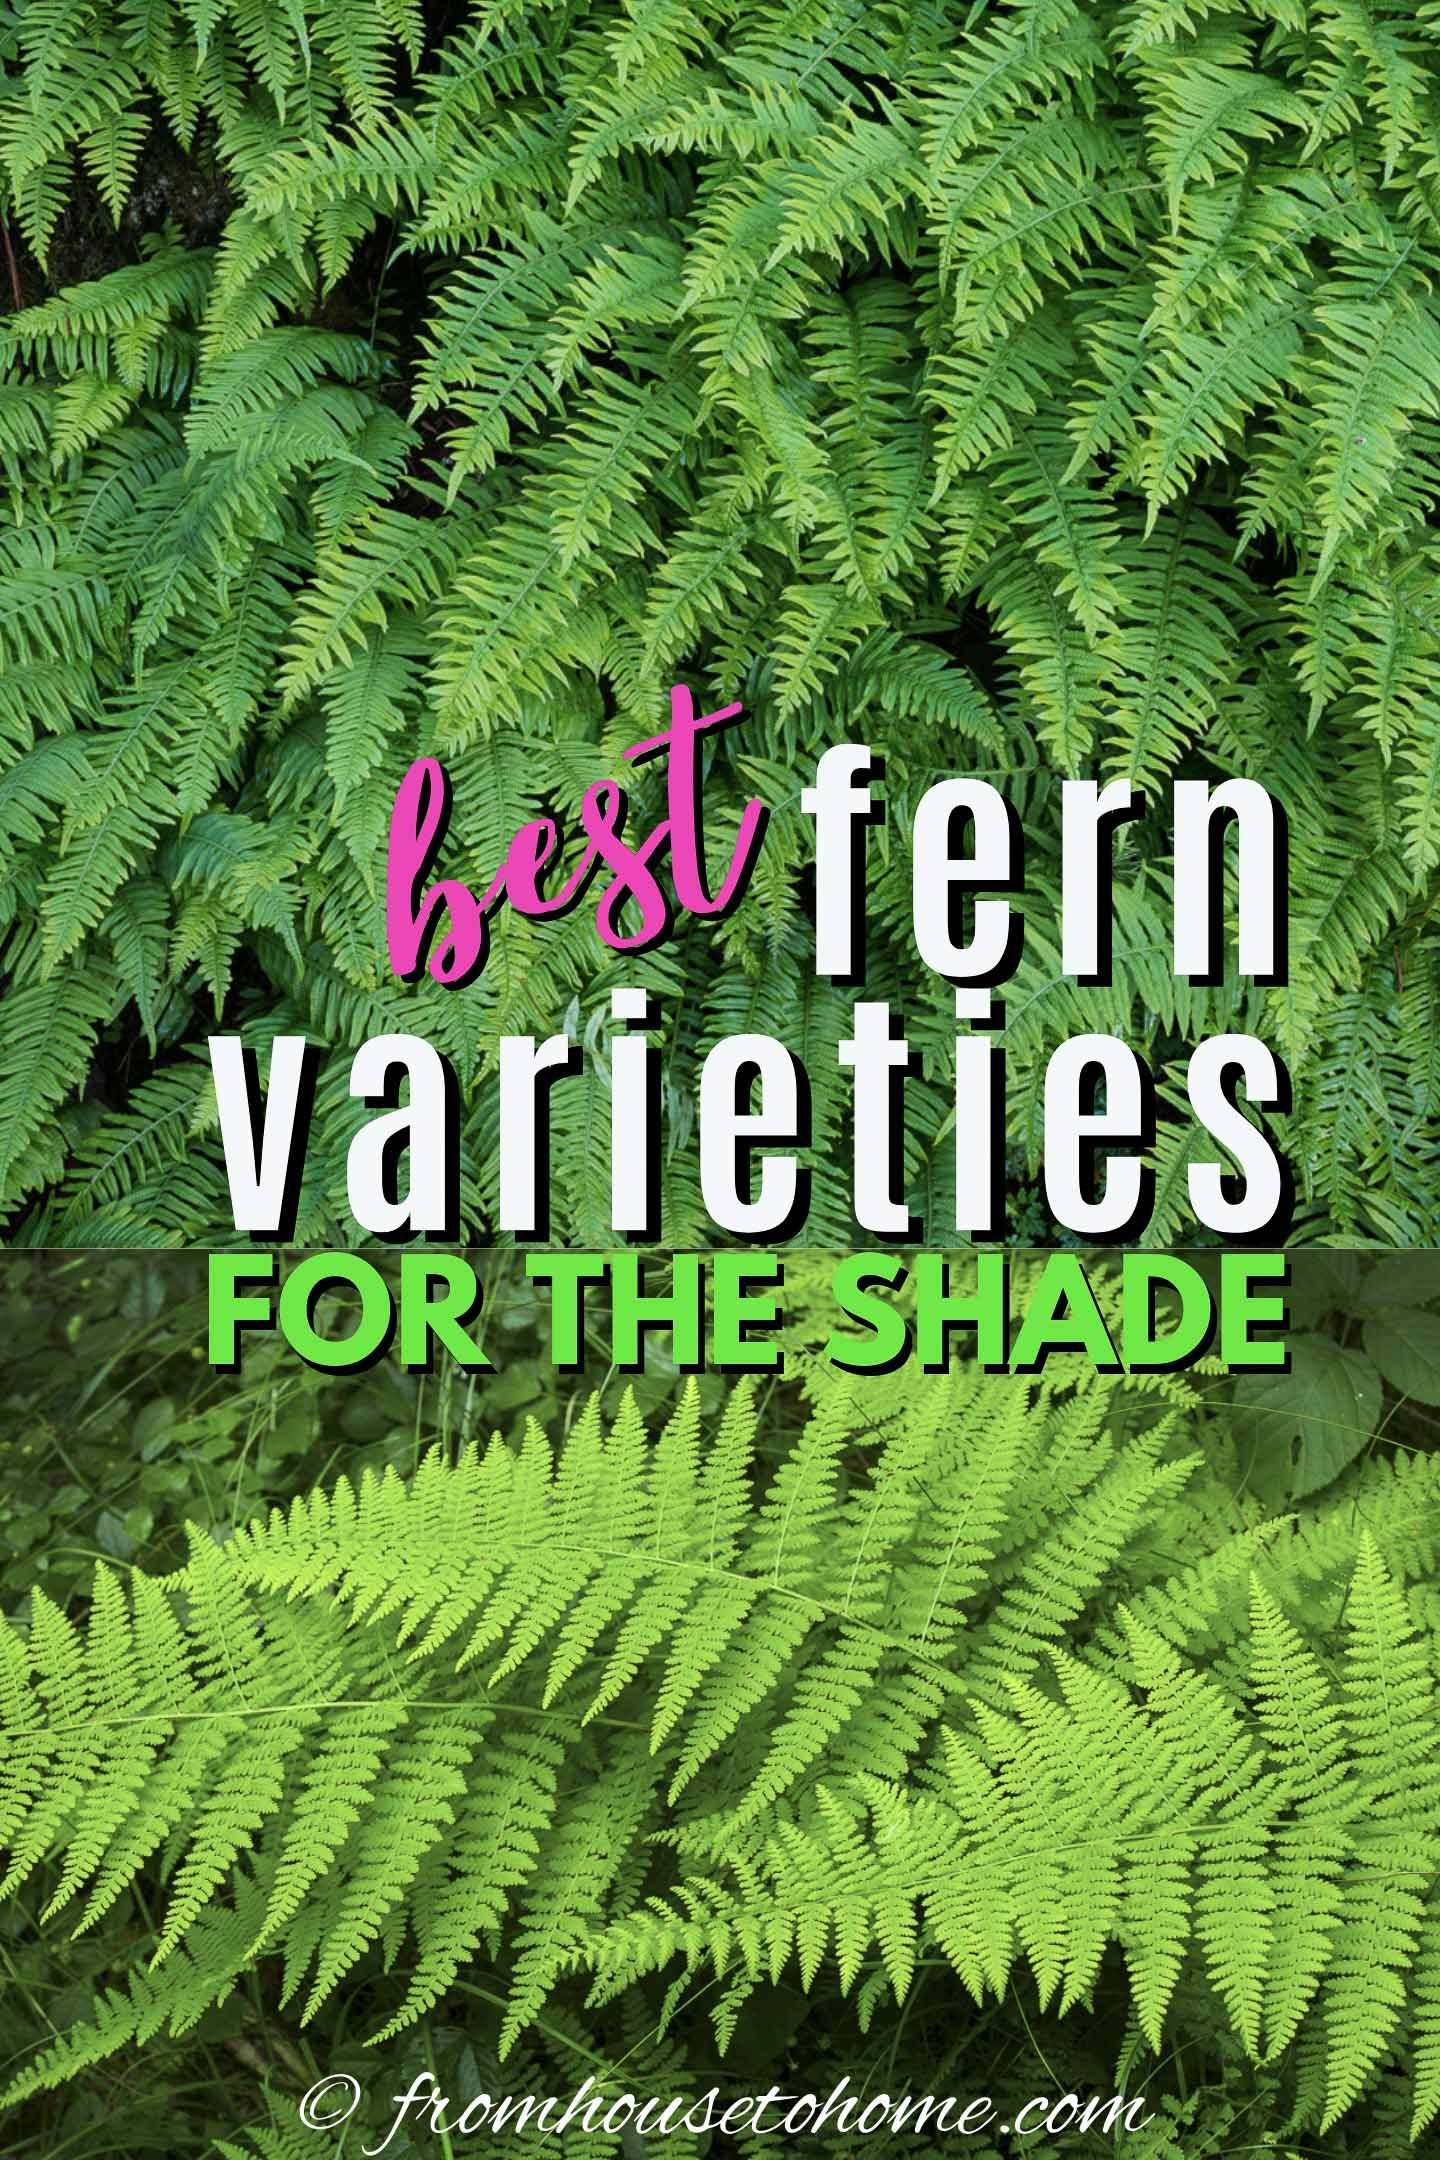 20 Winter Hardy Fern Varieties In 2020 Evergreen Ferns Shade Garden Plants Japanese Painted Fern